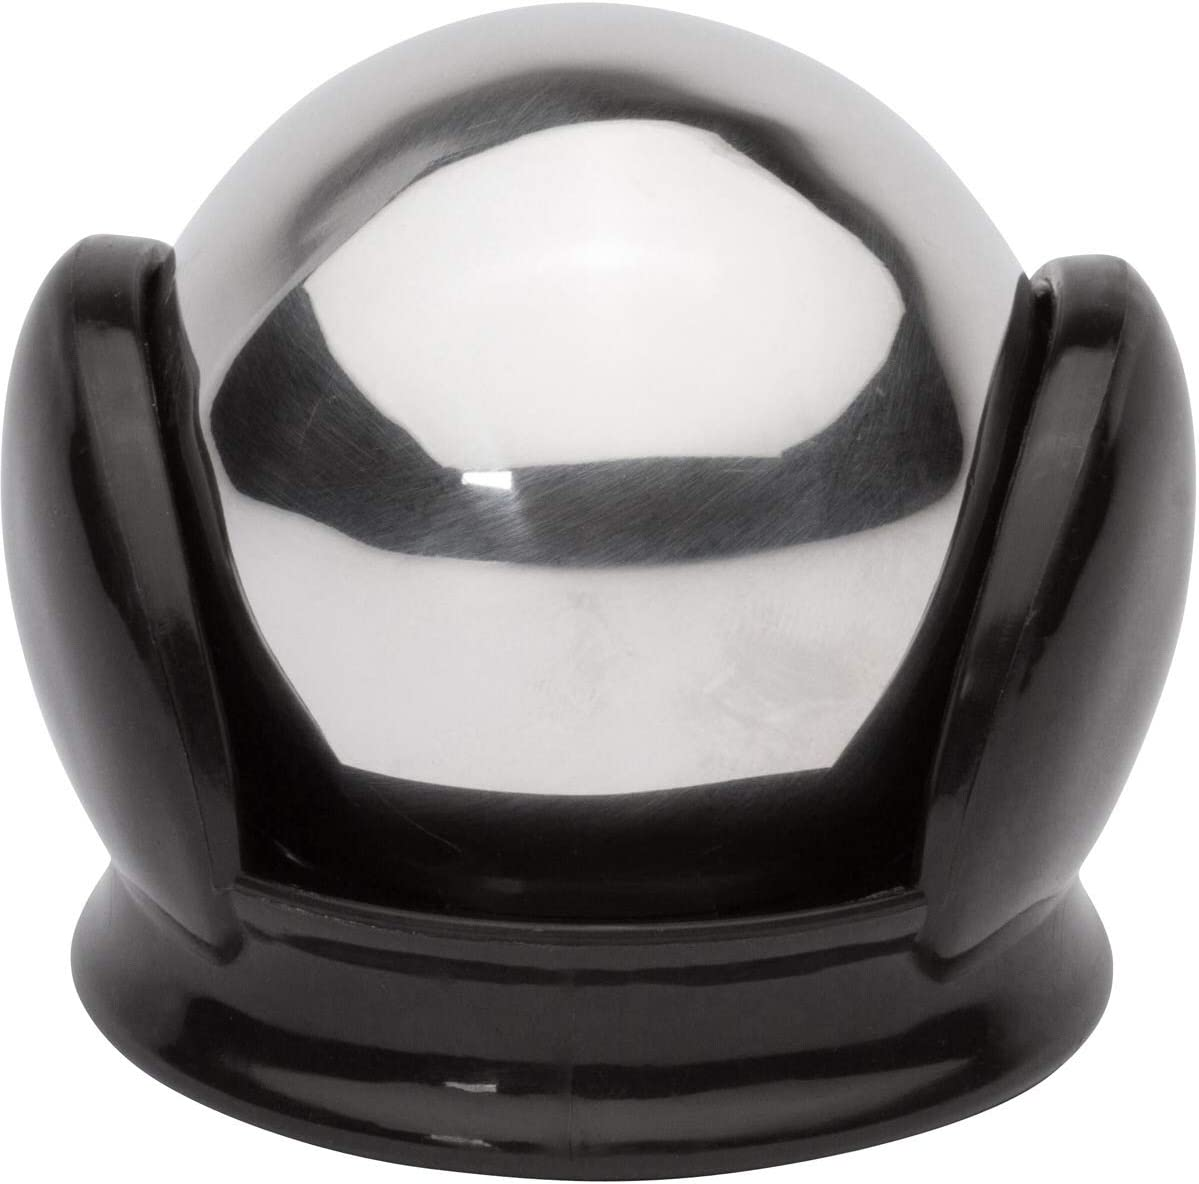 3Stk Igelball Massageball Triggerball Hand /&Fuß Massage Roller Fitnessrolle W8J2